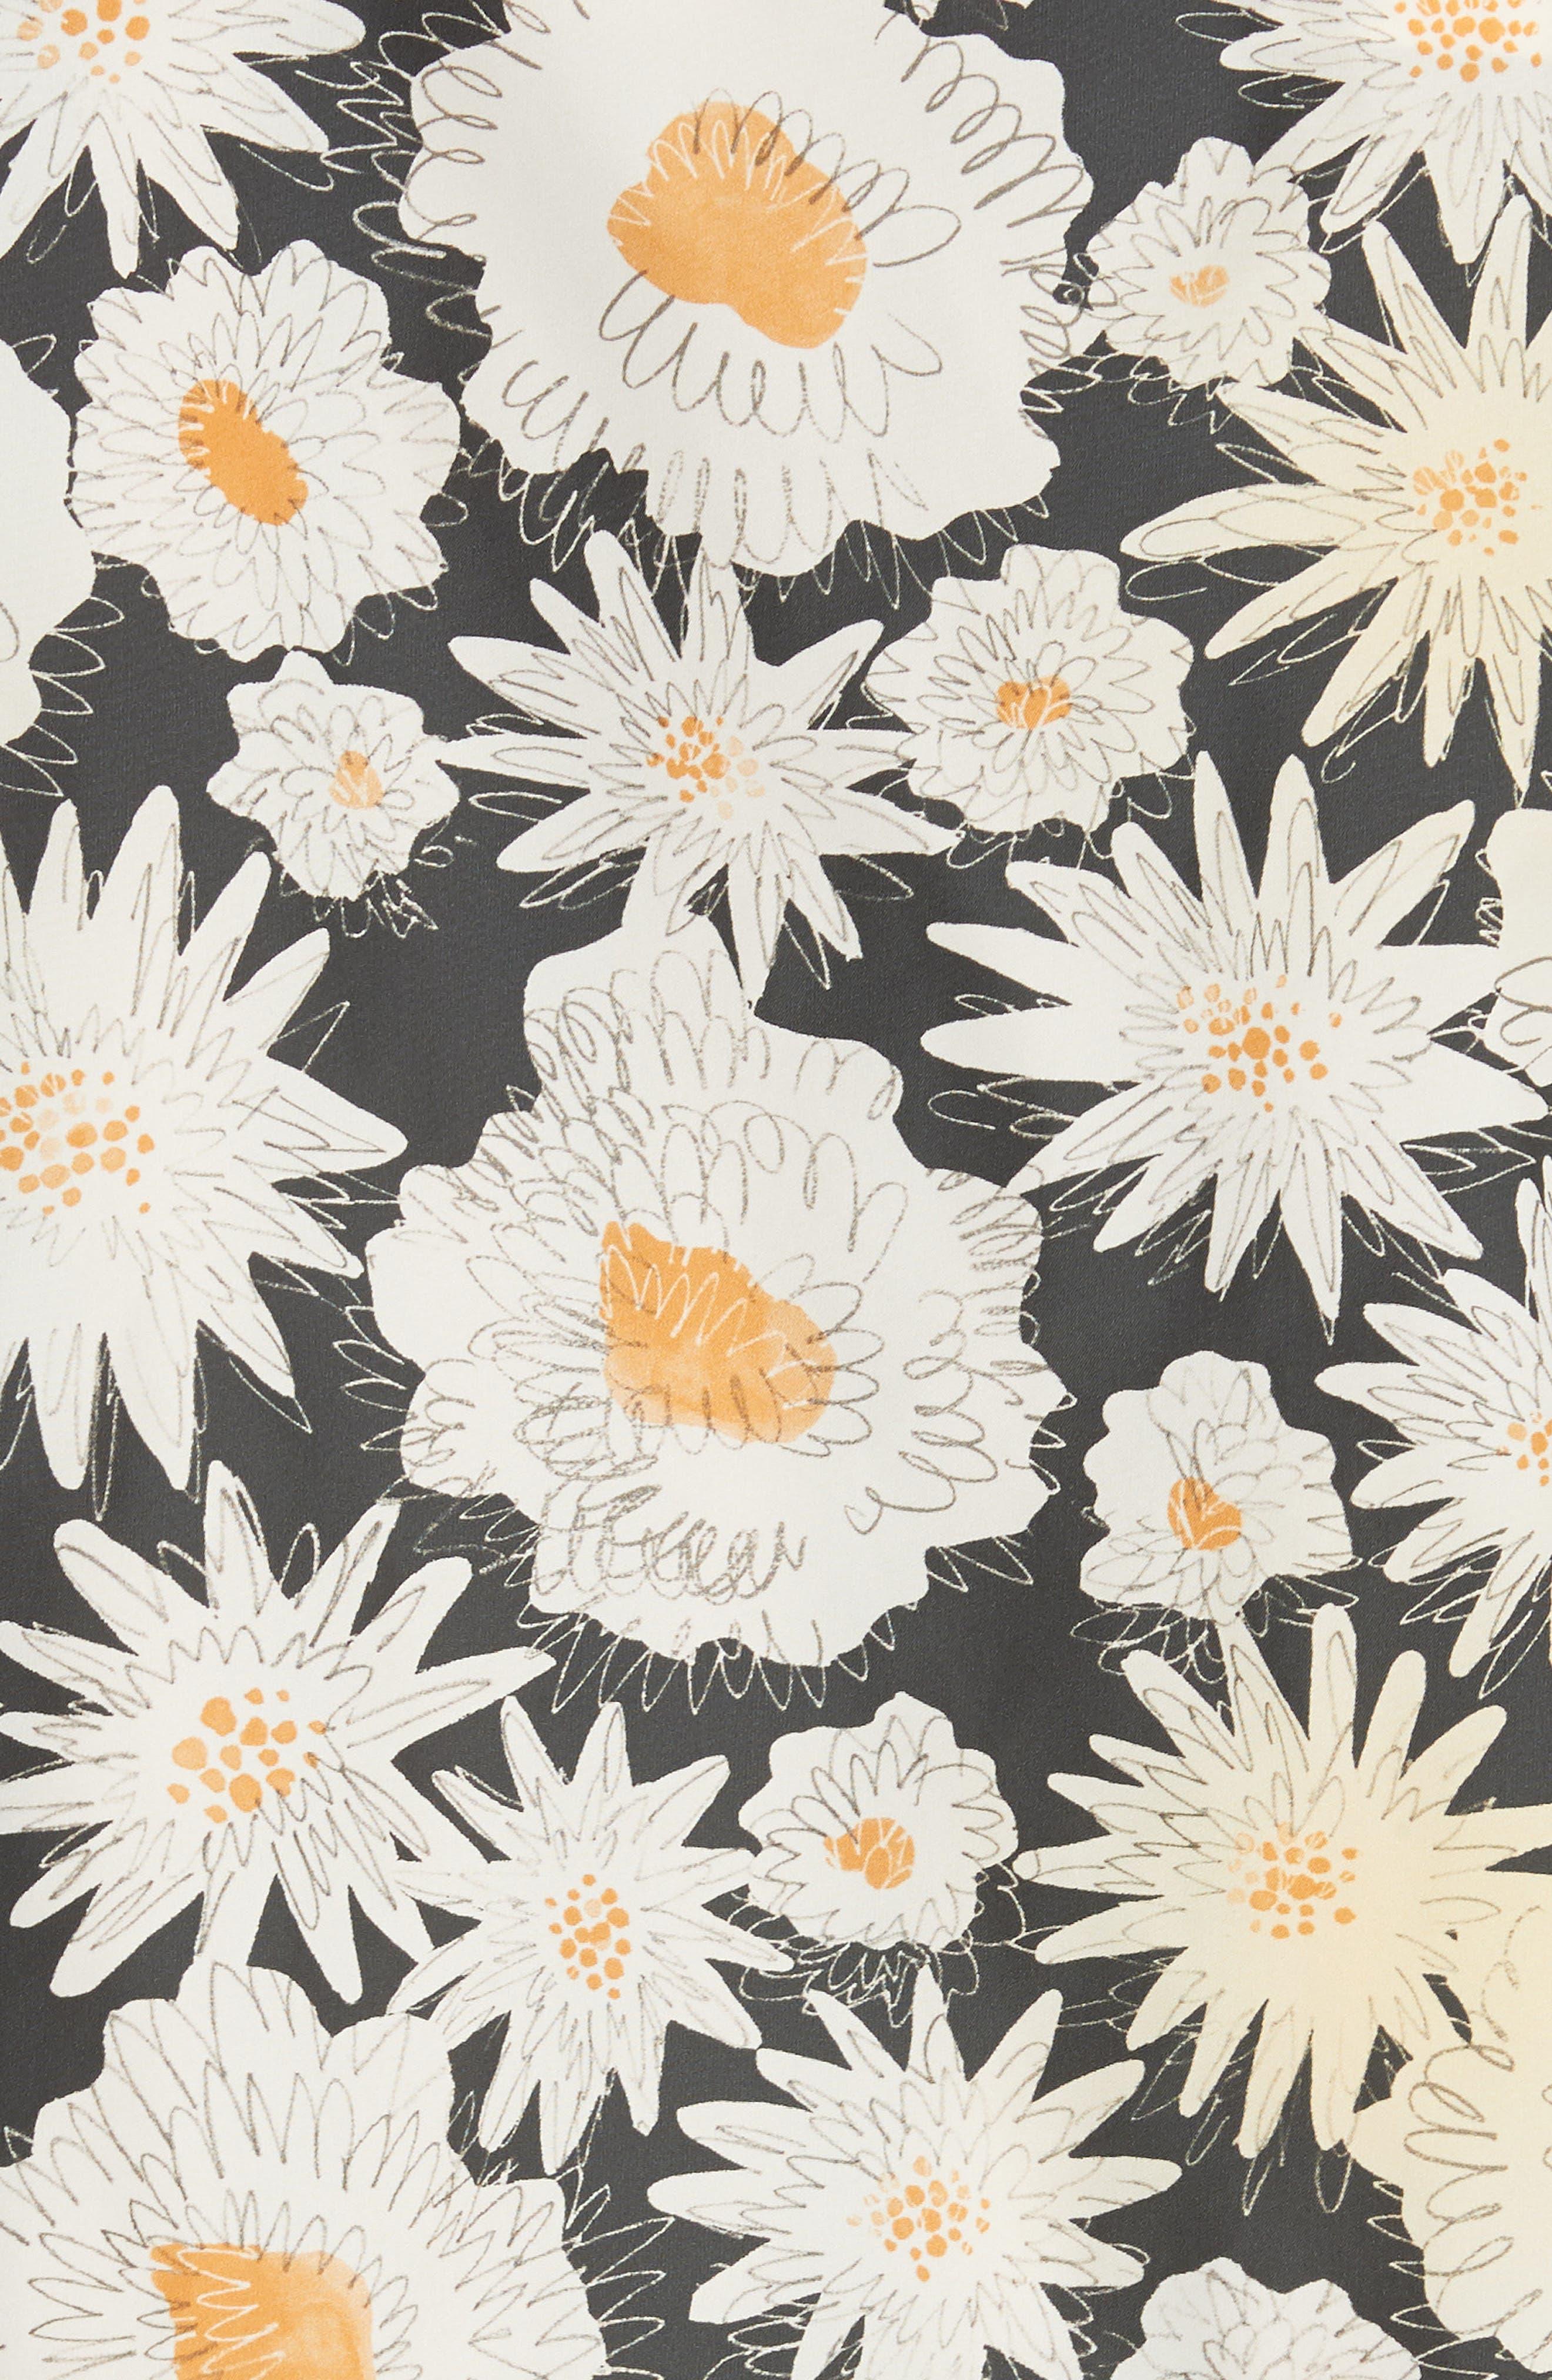 Fullerton Floral Print Windbreaker,                             Alternate thumbnail 6, color,                             001